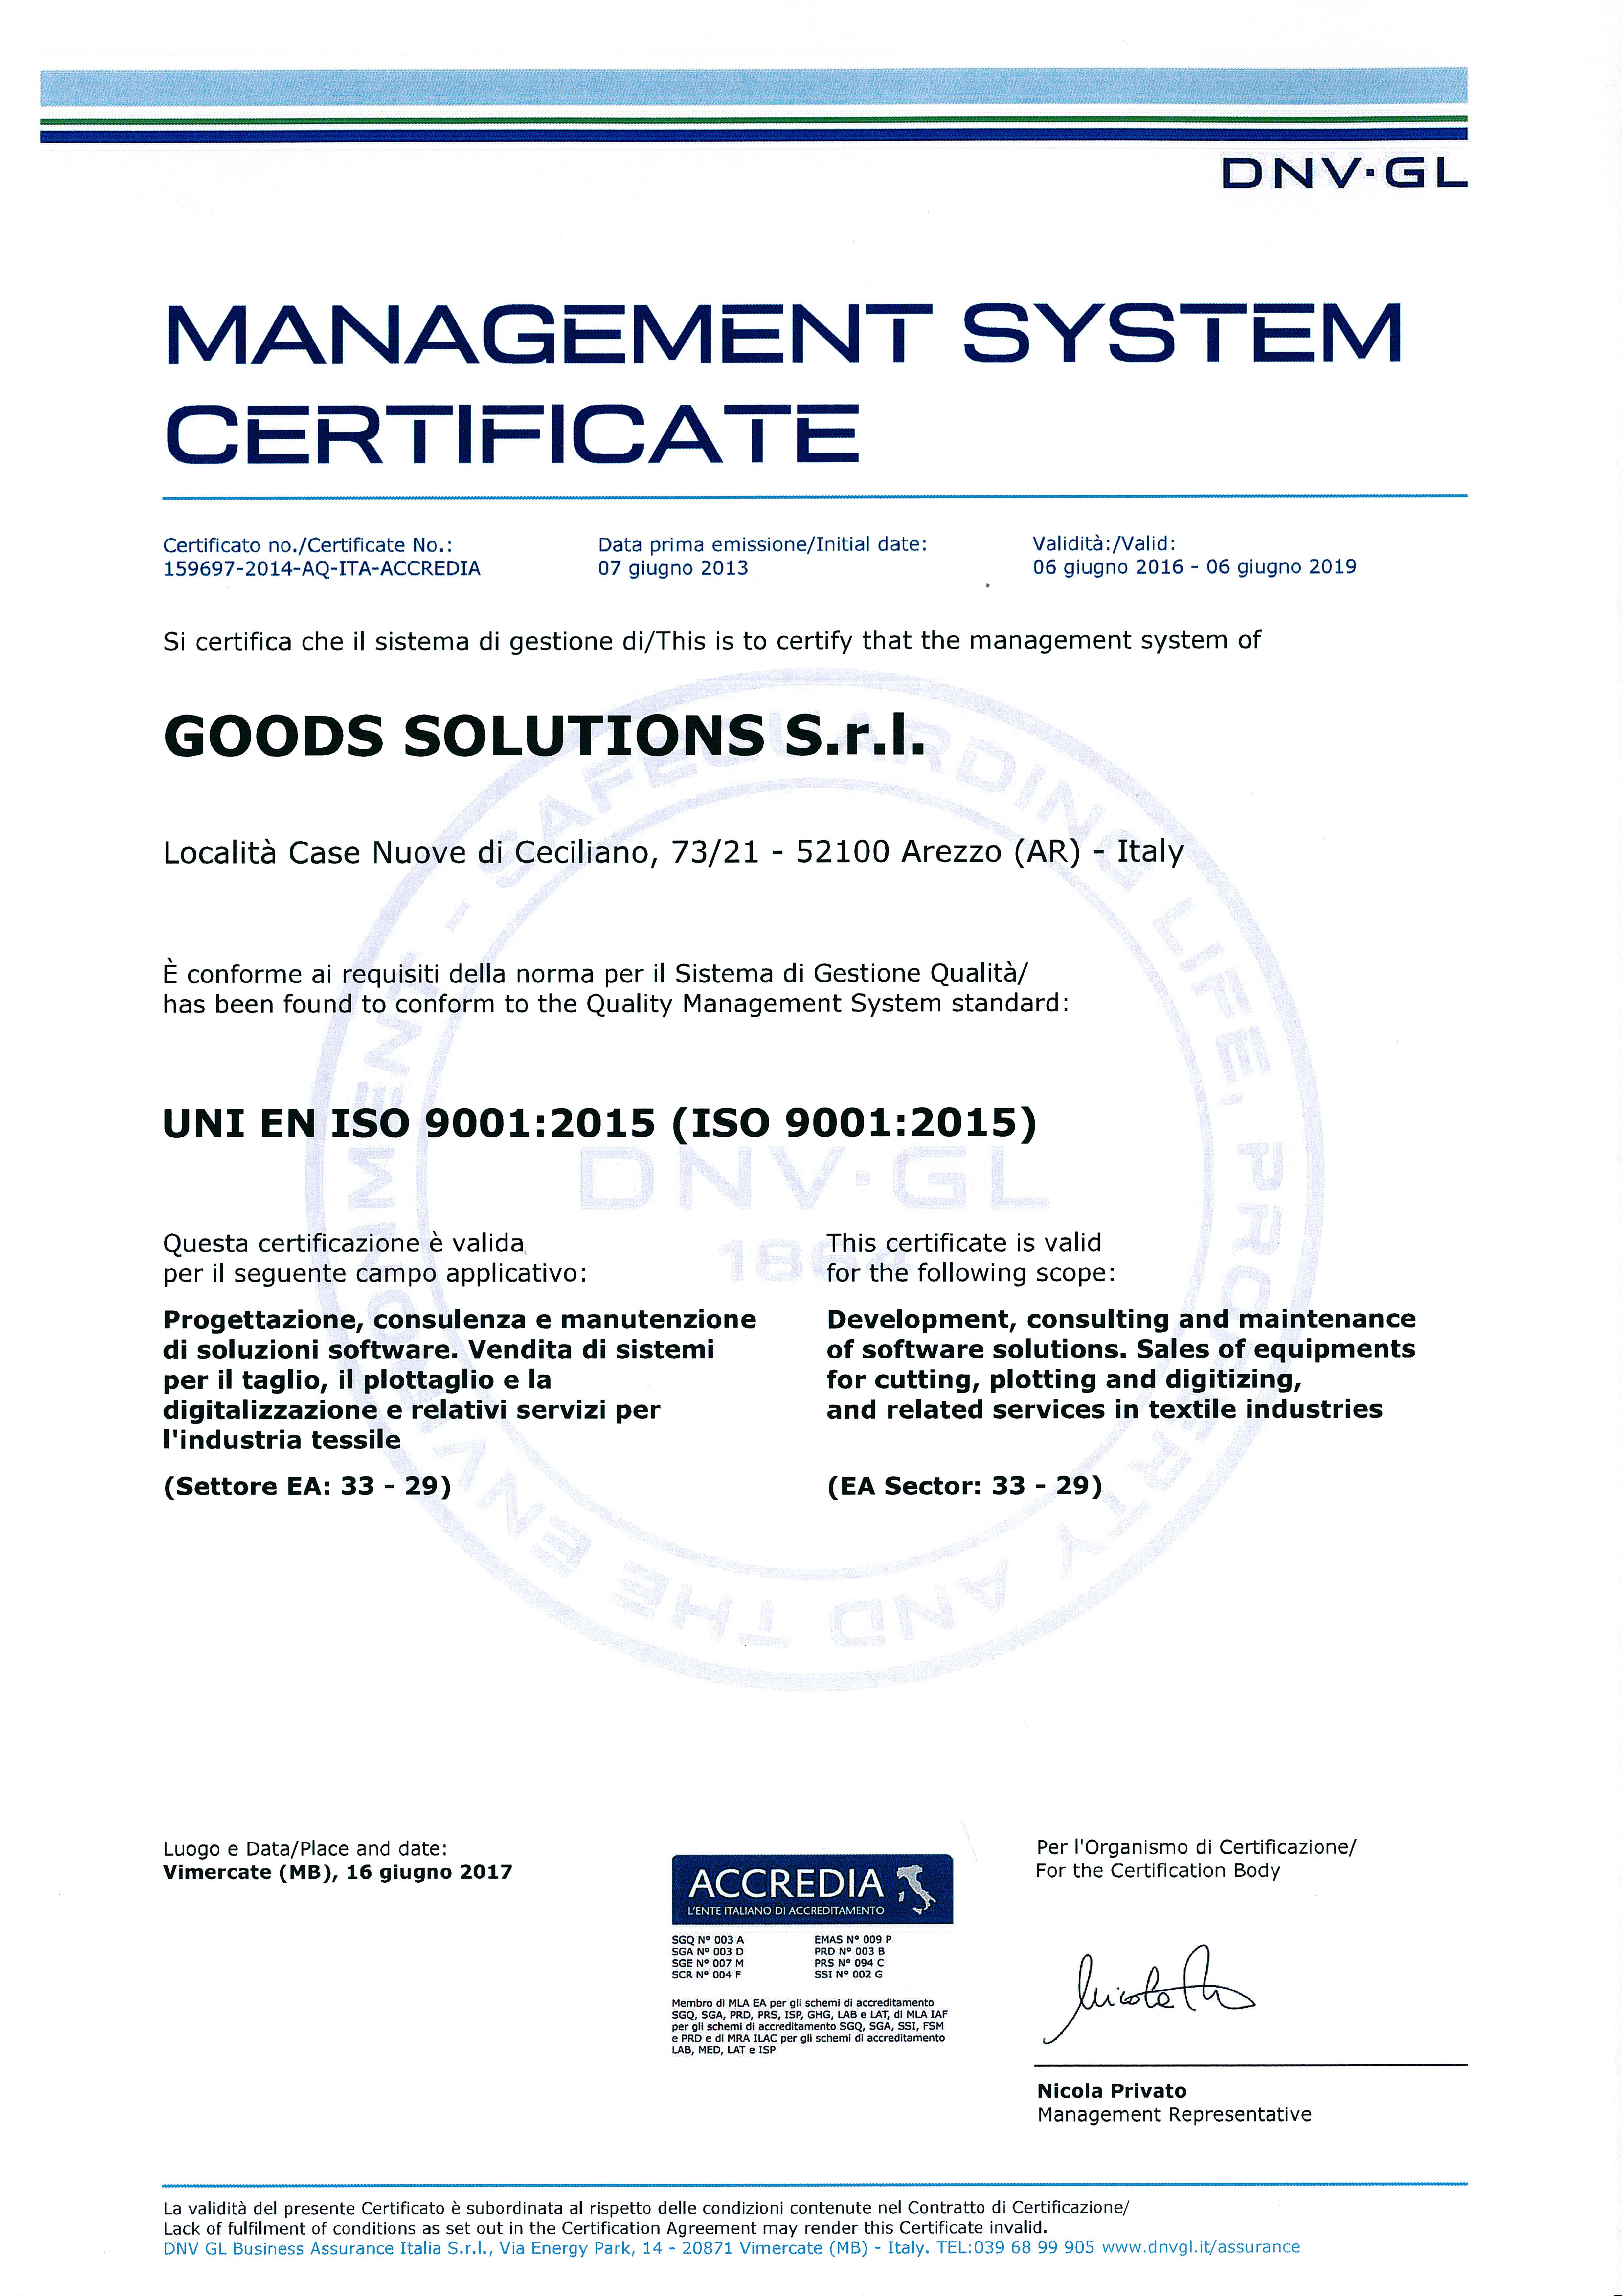 Certificati Iso 9001-2